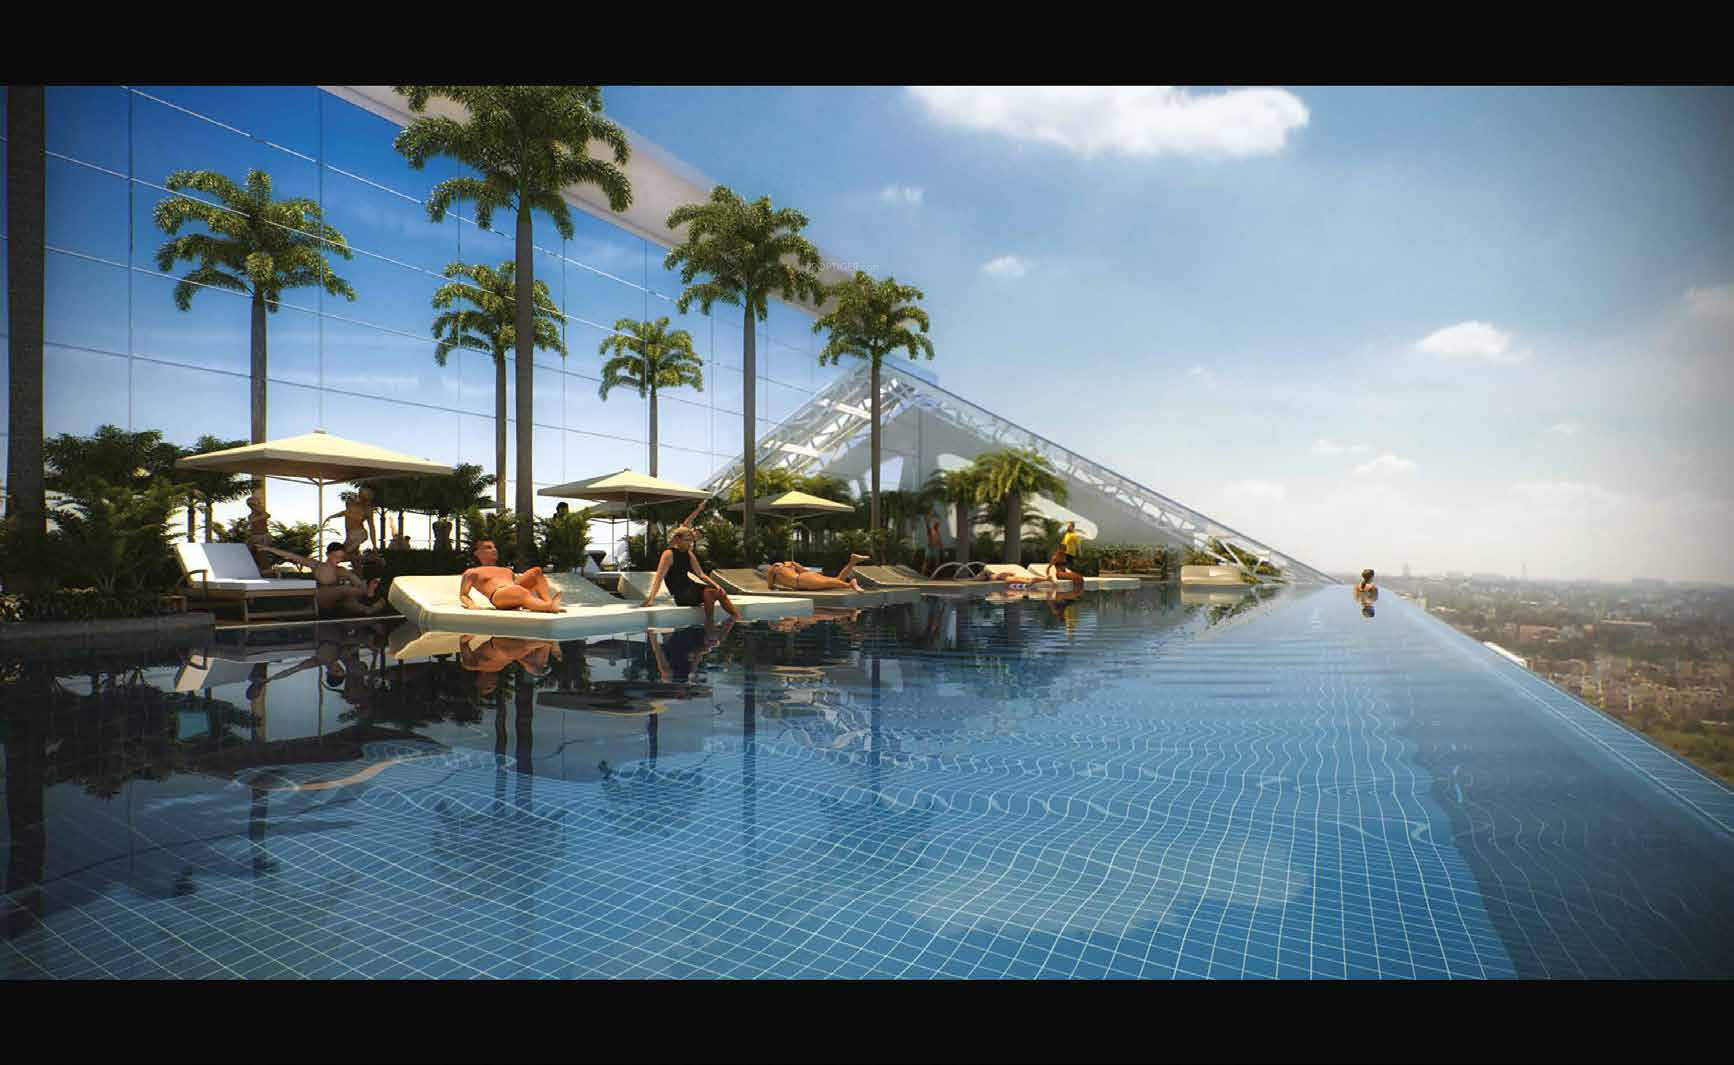 Sobha indraprastha in rajaji nagar bangalore price - Swimming pool builders in bangalore ...